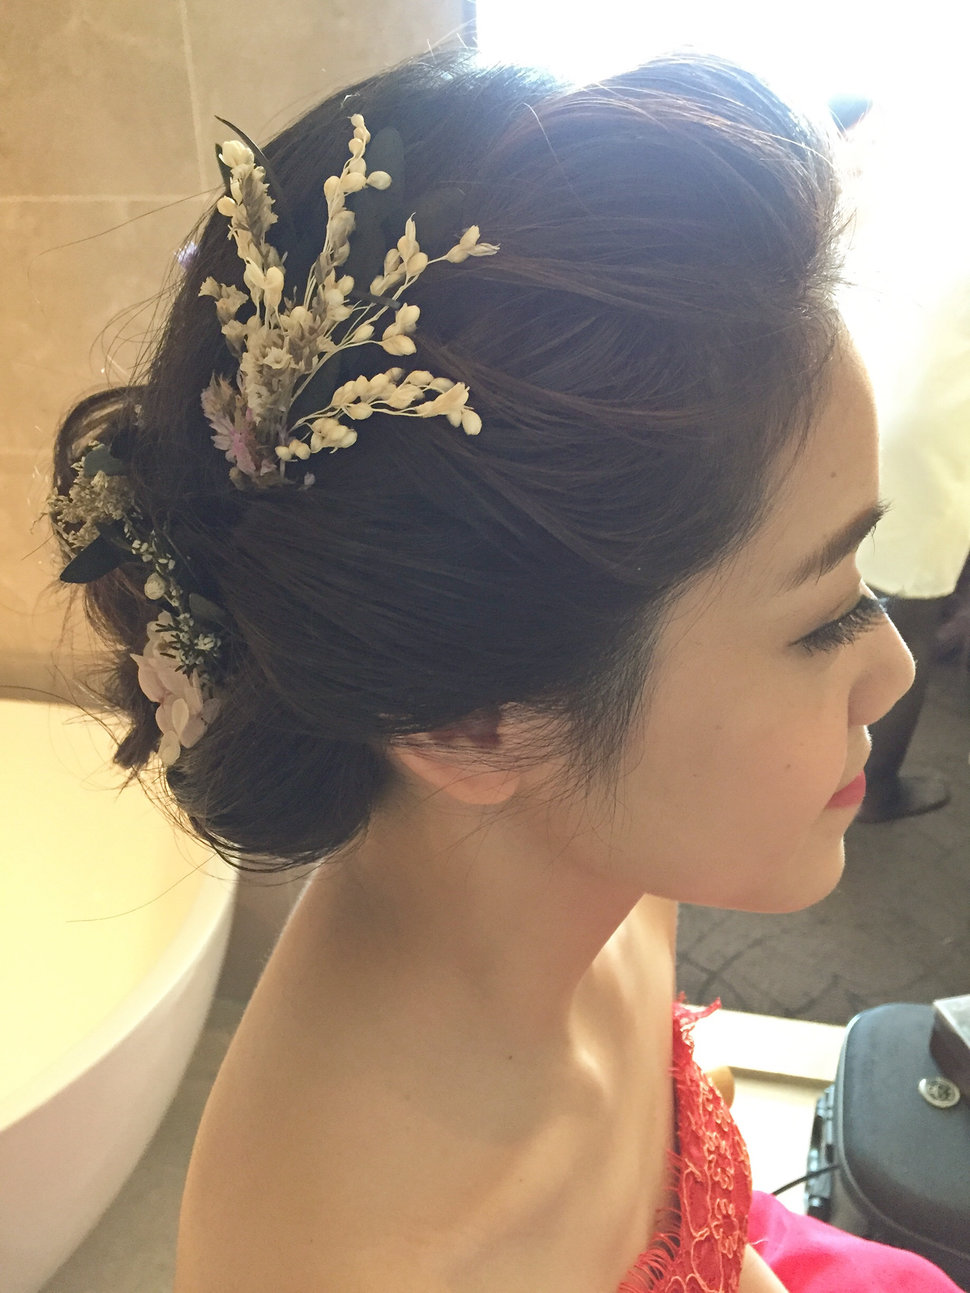 IMG_4283 - Jojo chen Makeup新娘秘書《結婚吧》